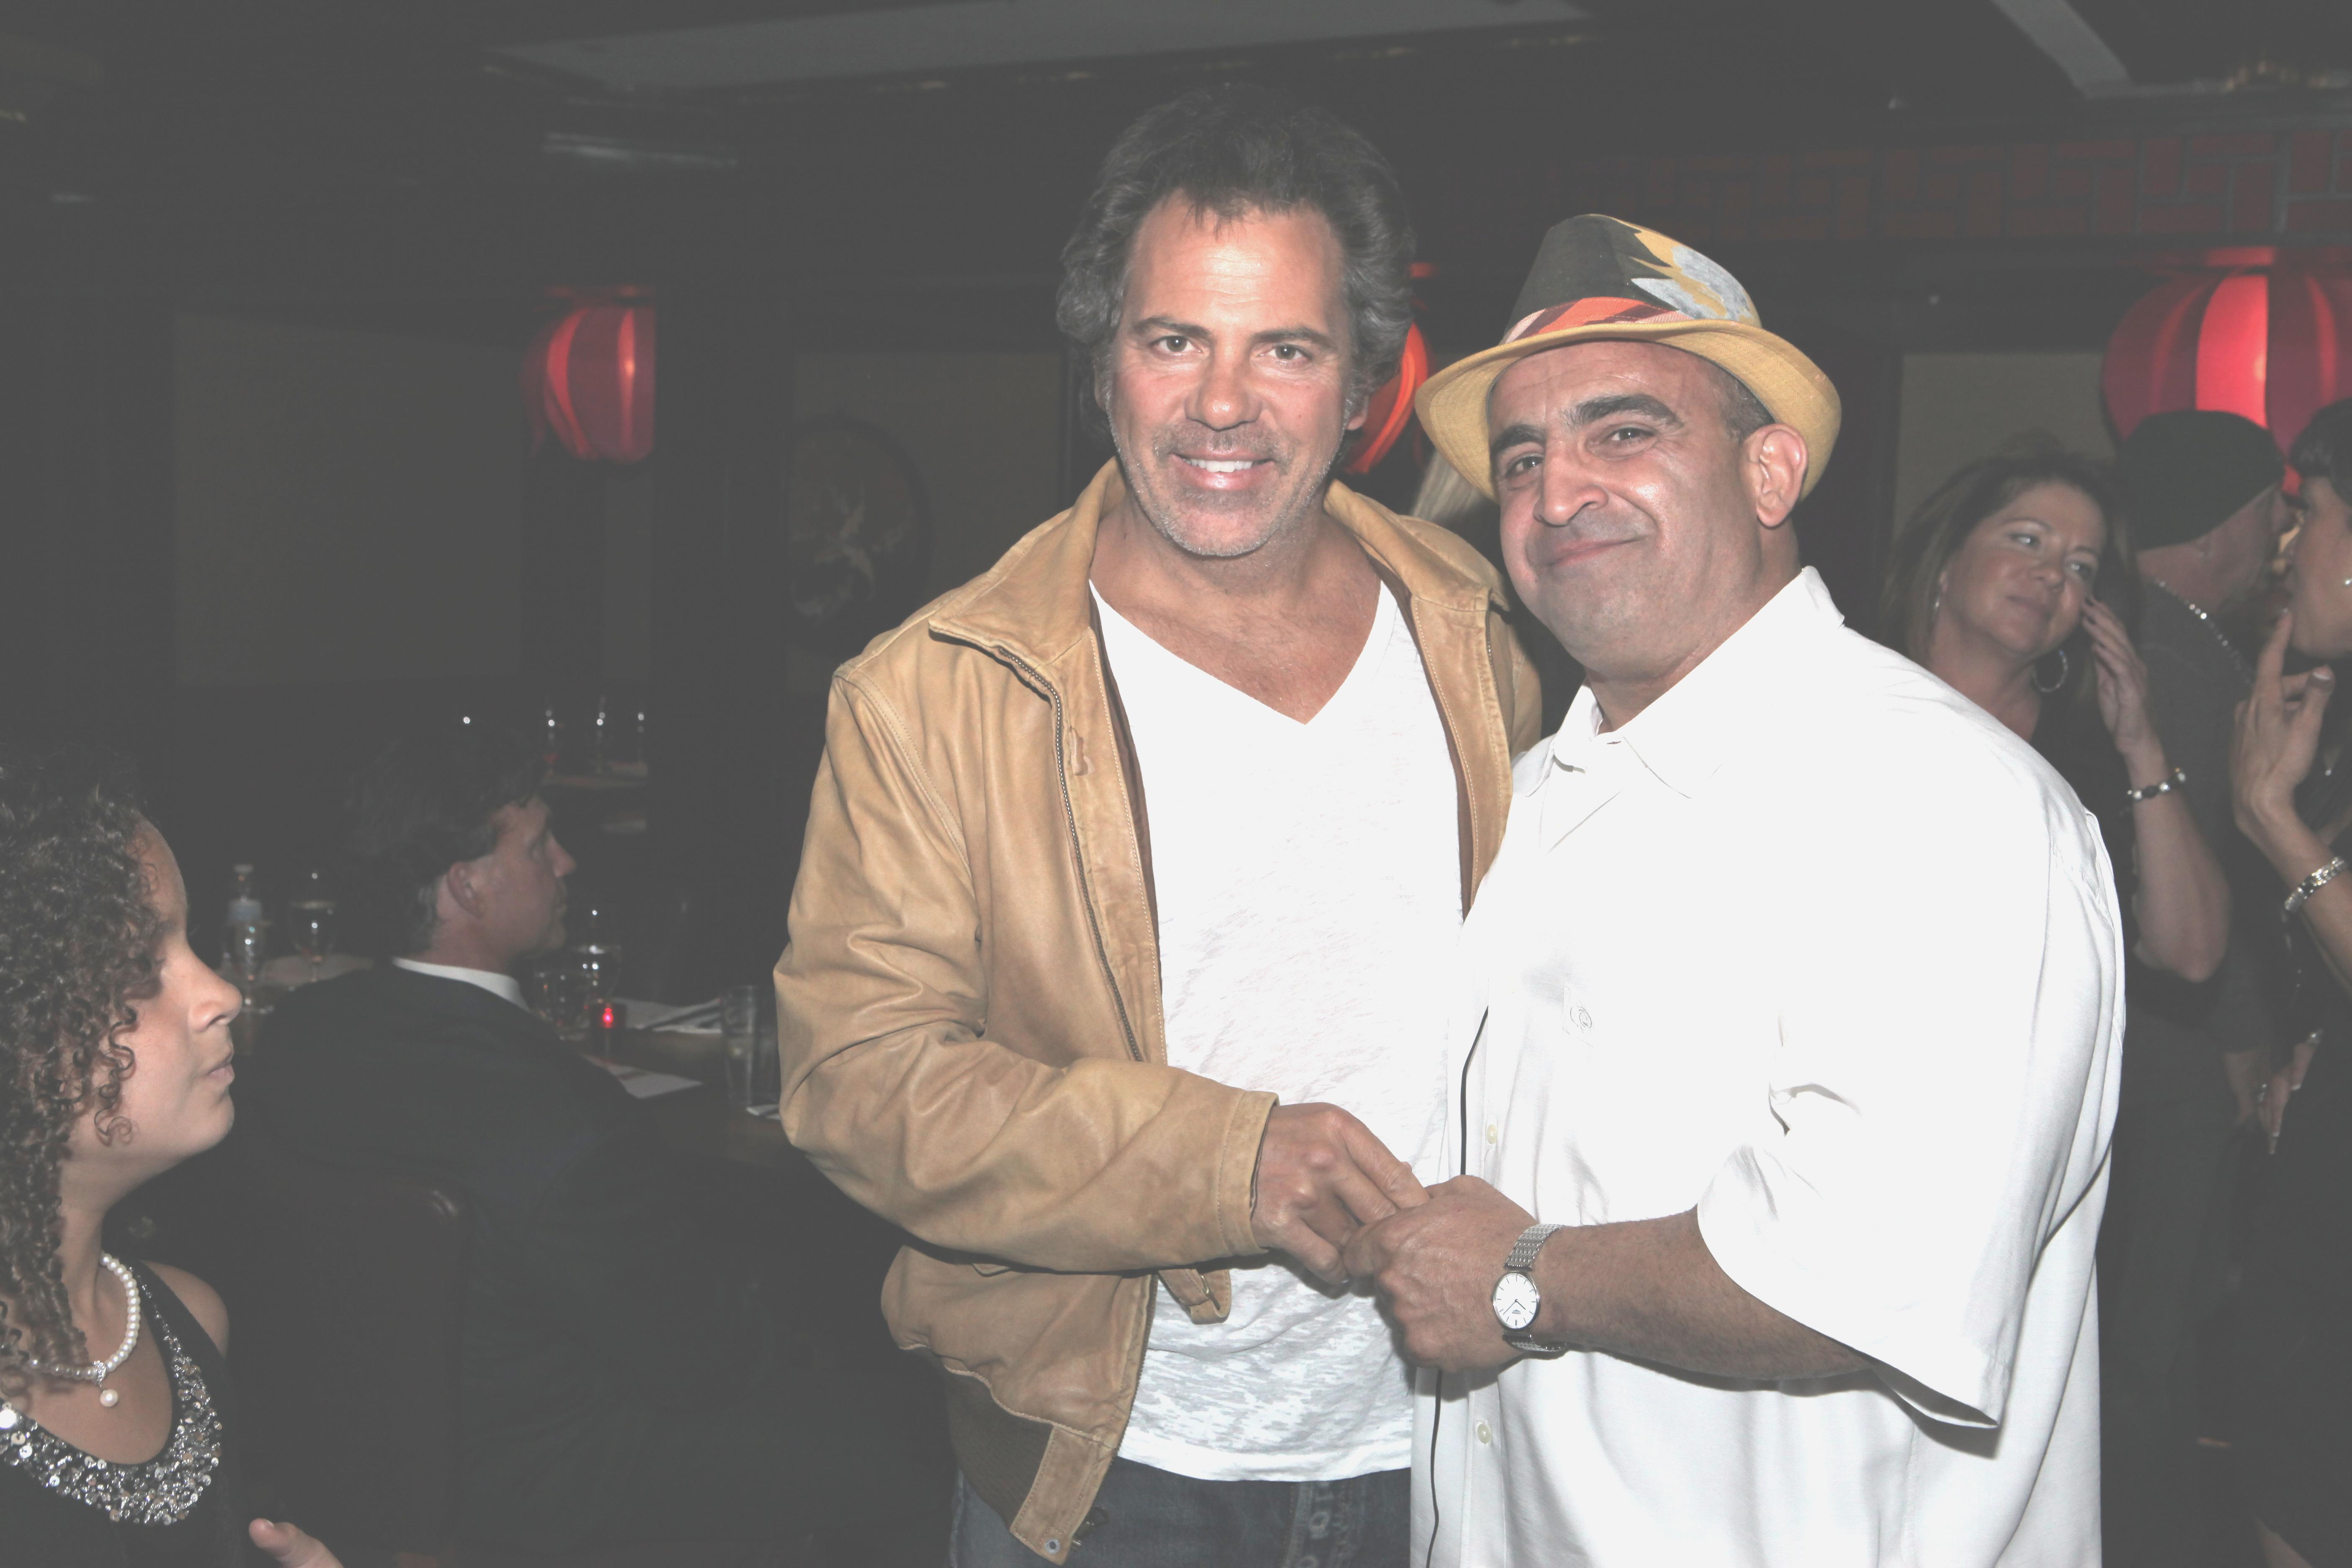 Joe Antouri with Mentor Tom Gores.